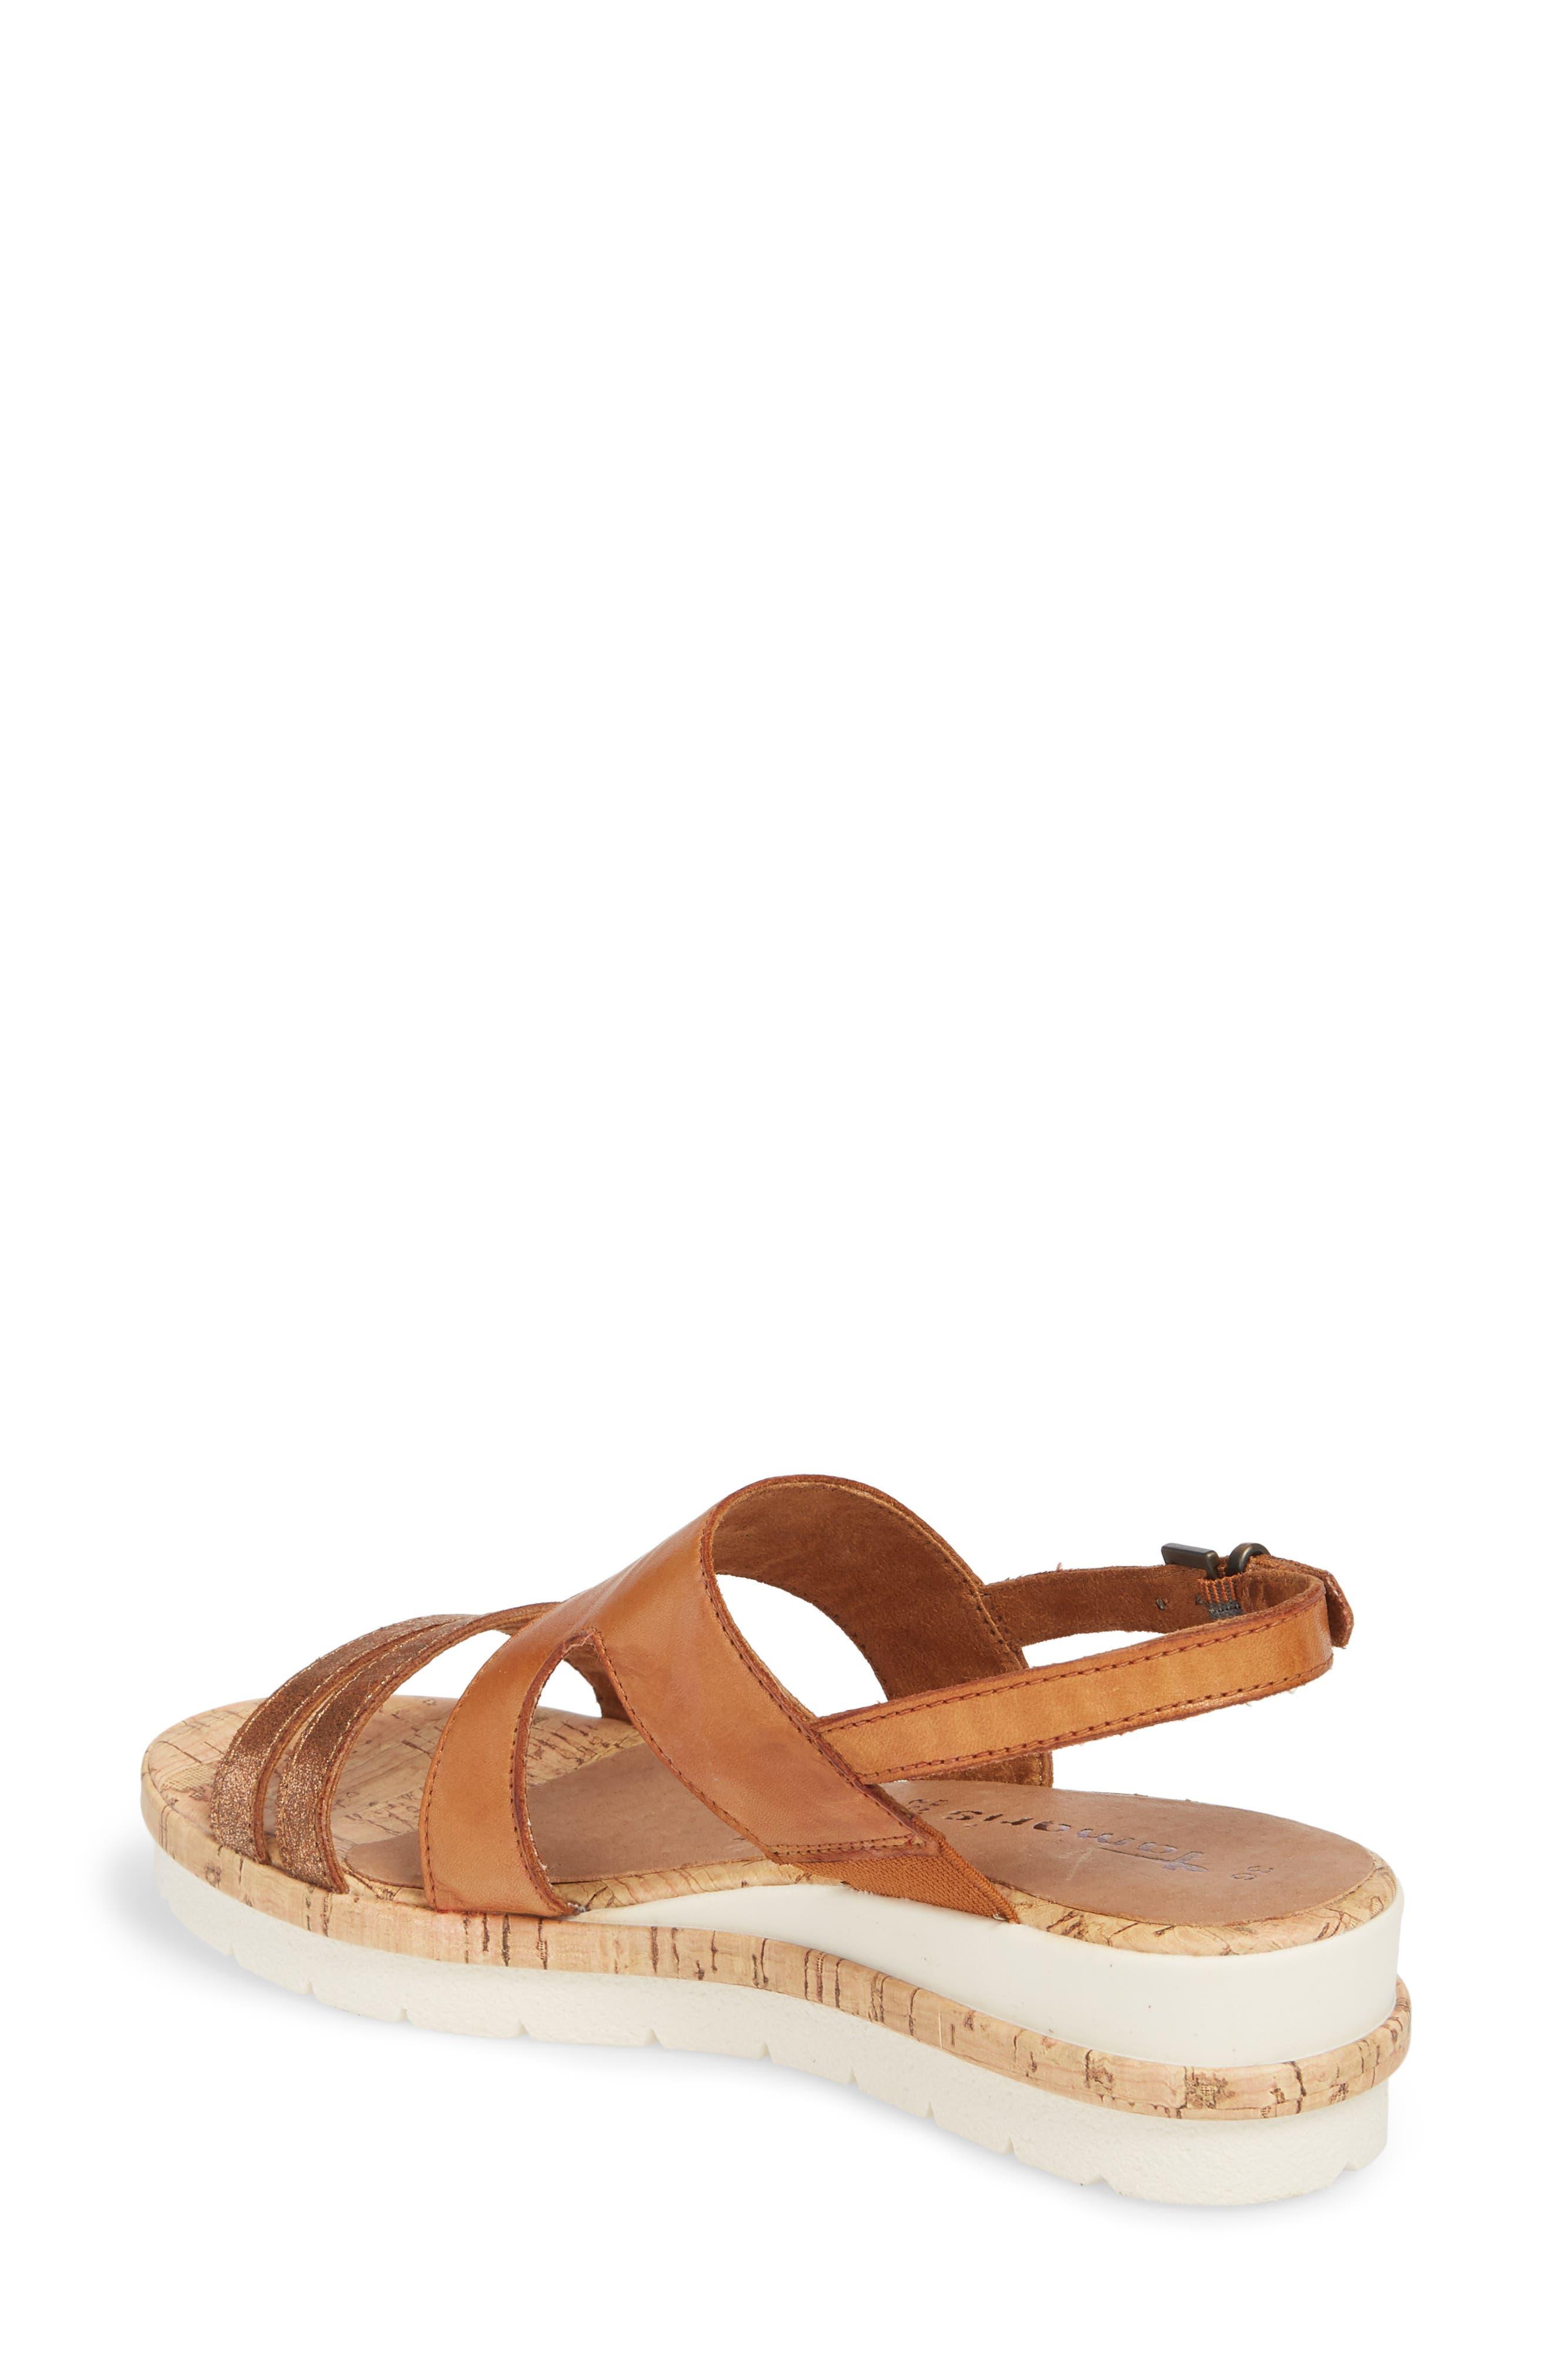 Eda Wedge Sandal,                             Alternate thumbnail 2, color,                             Nut Leather